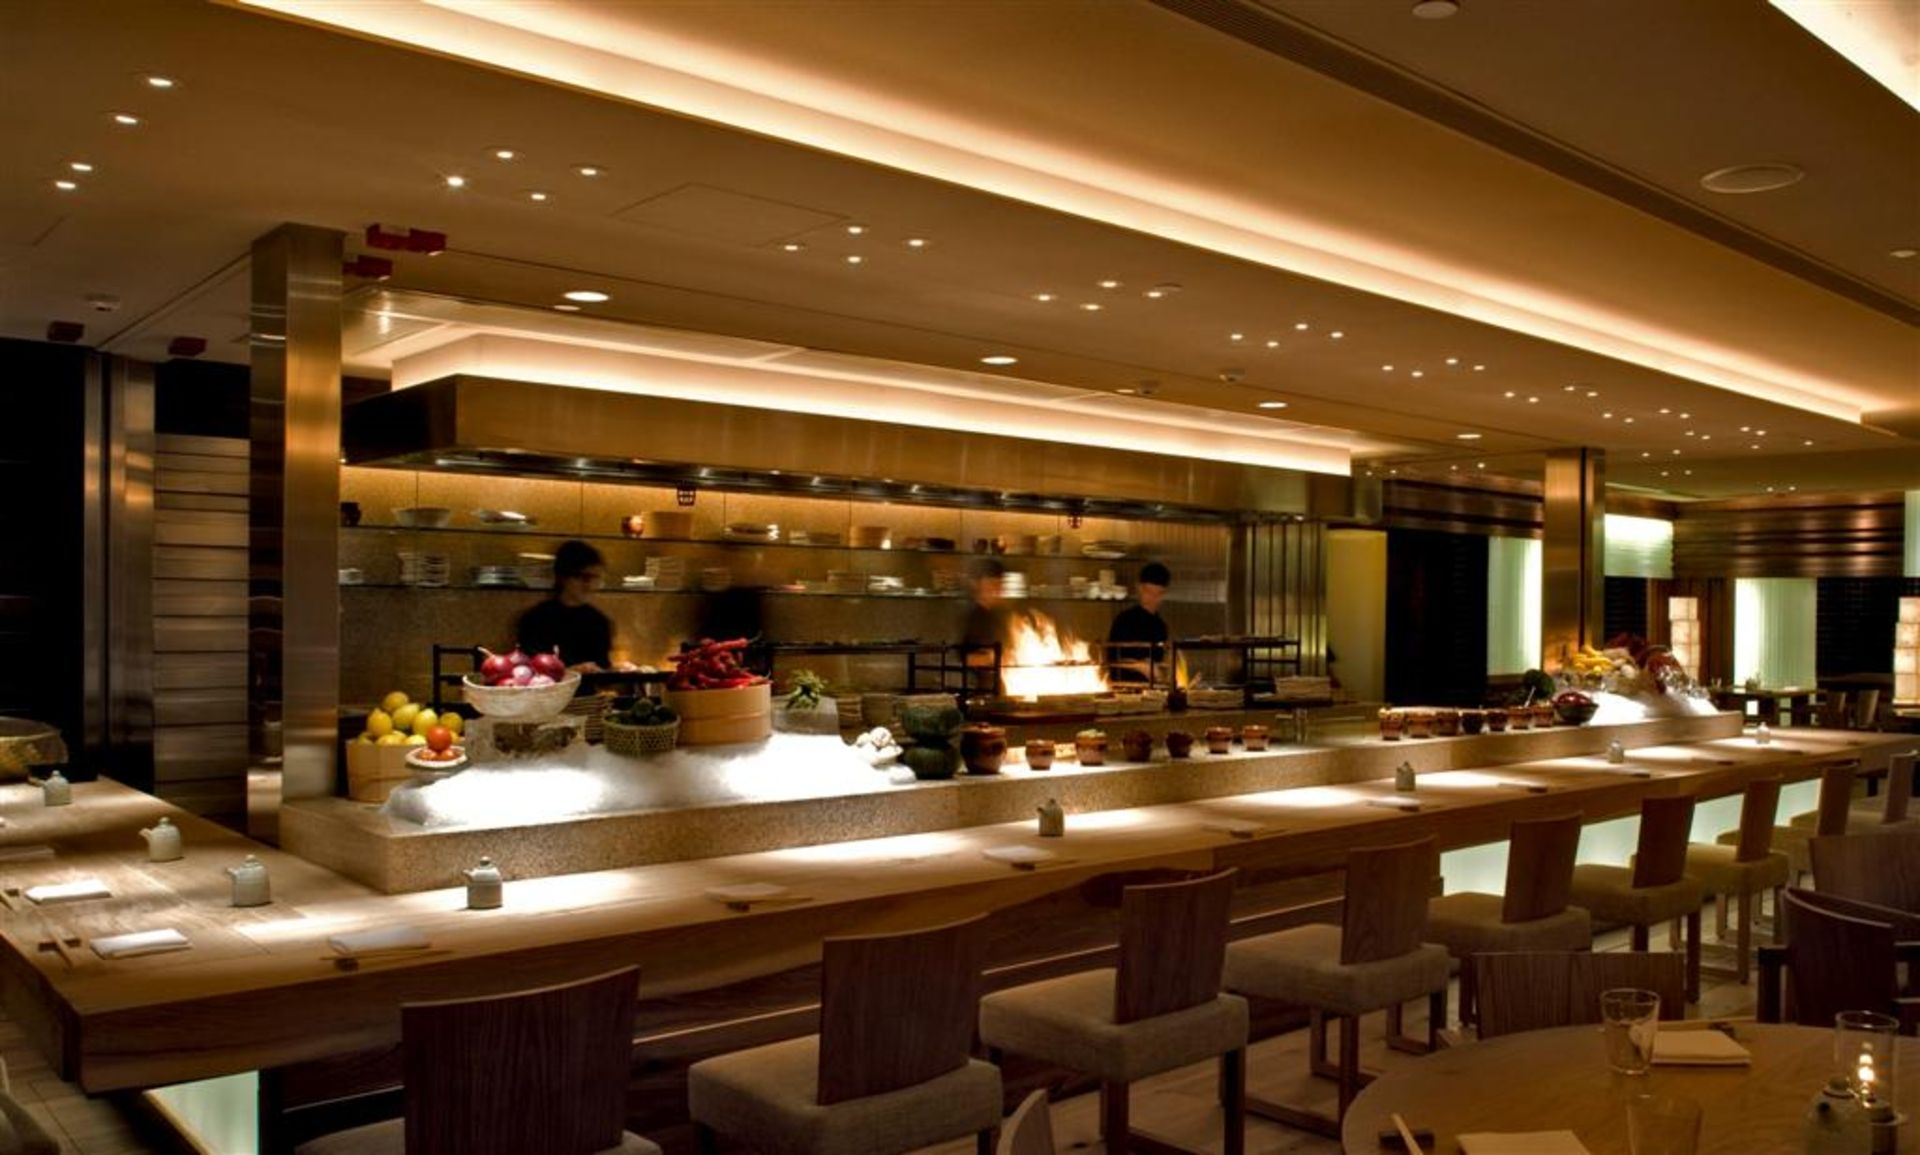 Restaurant-Bar-Interior-Design-Ideas-USA-5.jpg 1,920×1,155 pixels ...